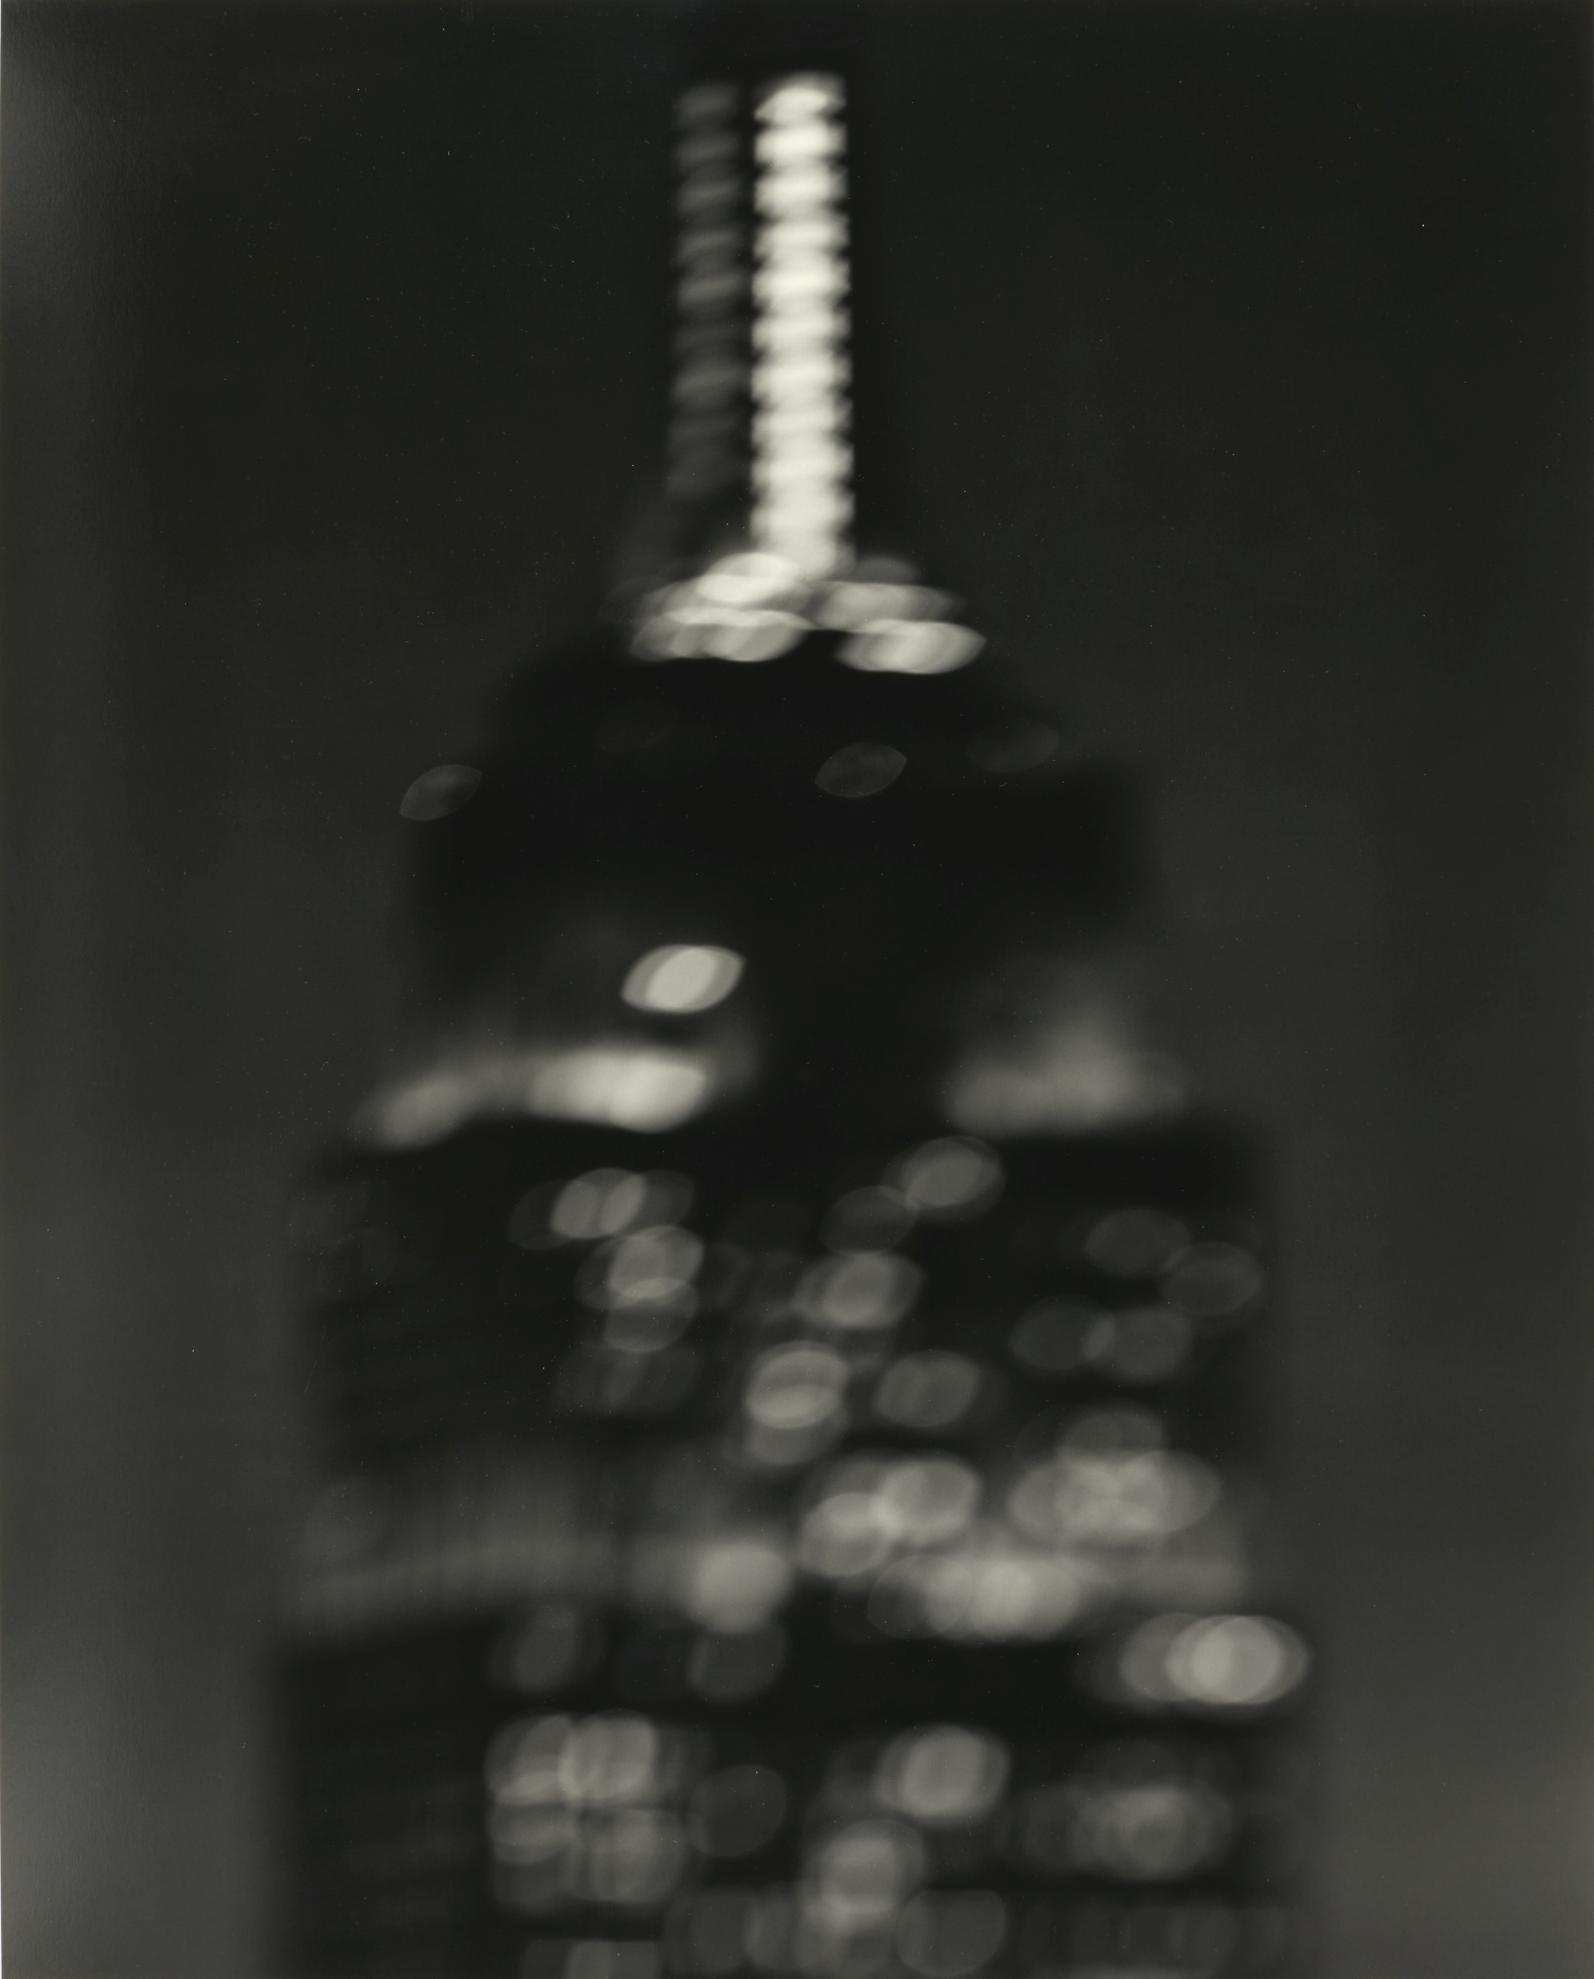 Hiroshi Sugimoto-Empire State Building, 1997-1997